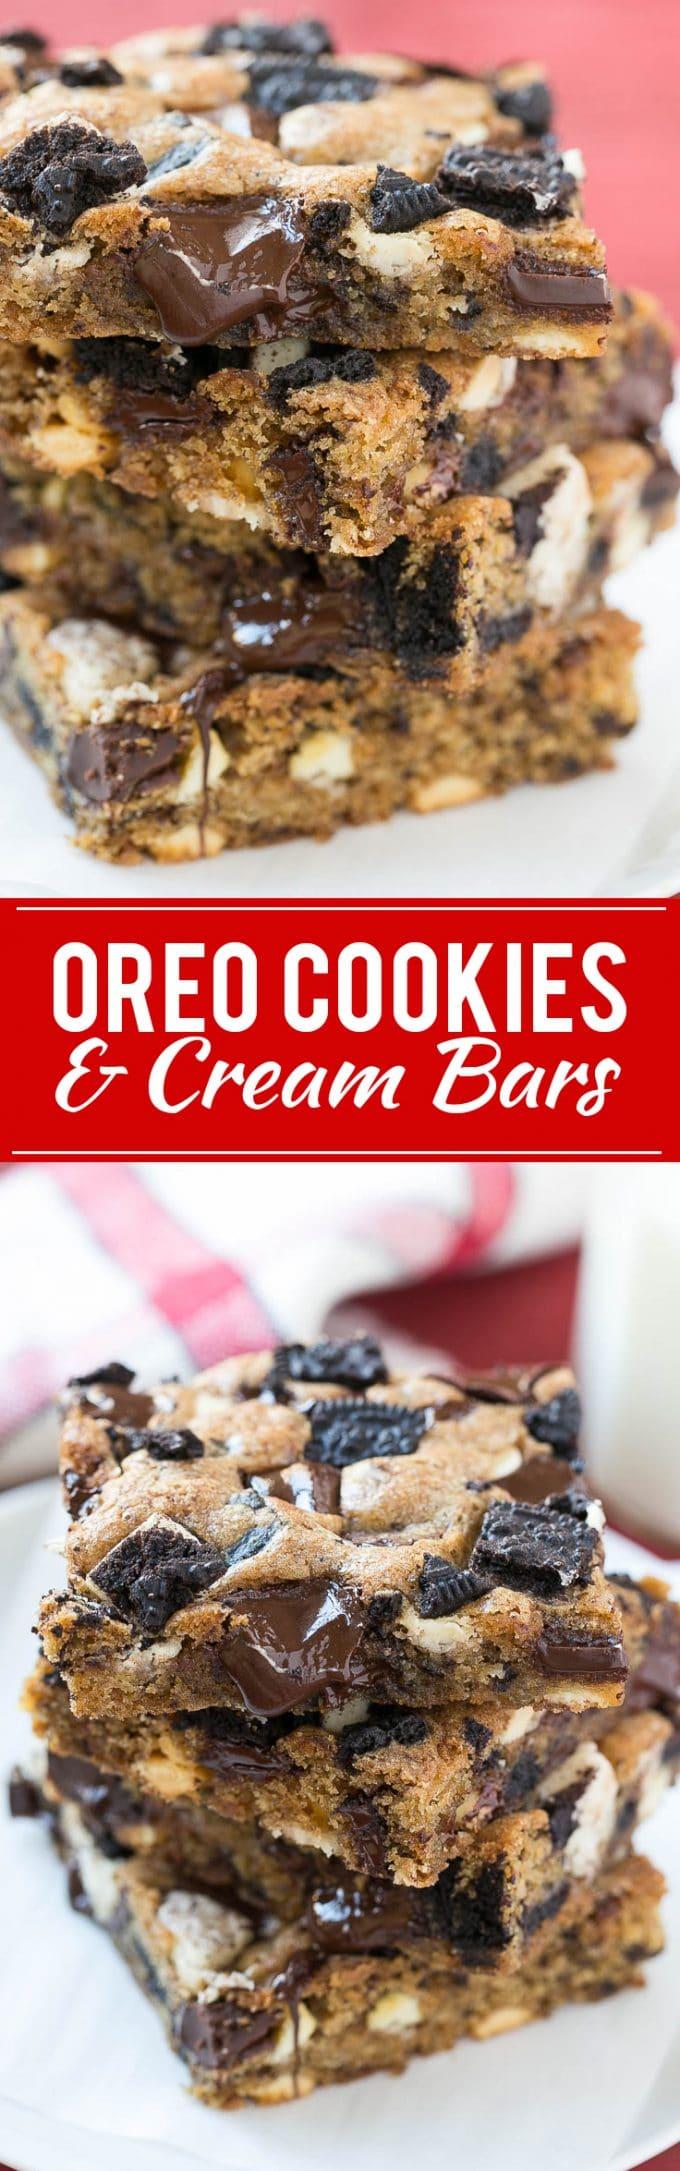 Oreo Cookies and Cream Bar | Best Oreo Bar | Best Cookie Bar | Cookies and Cream Bar